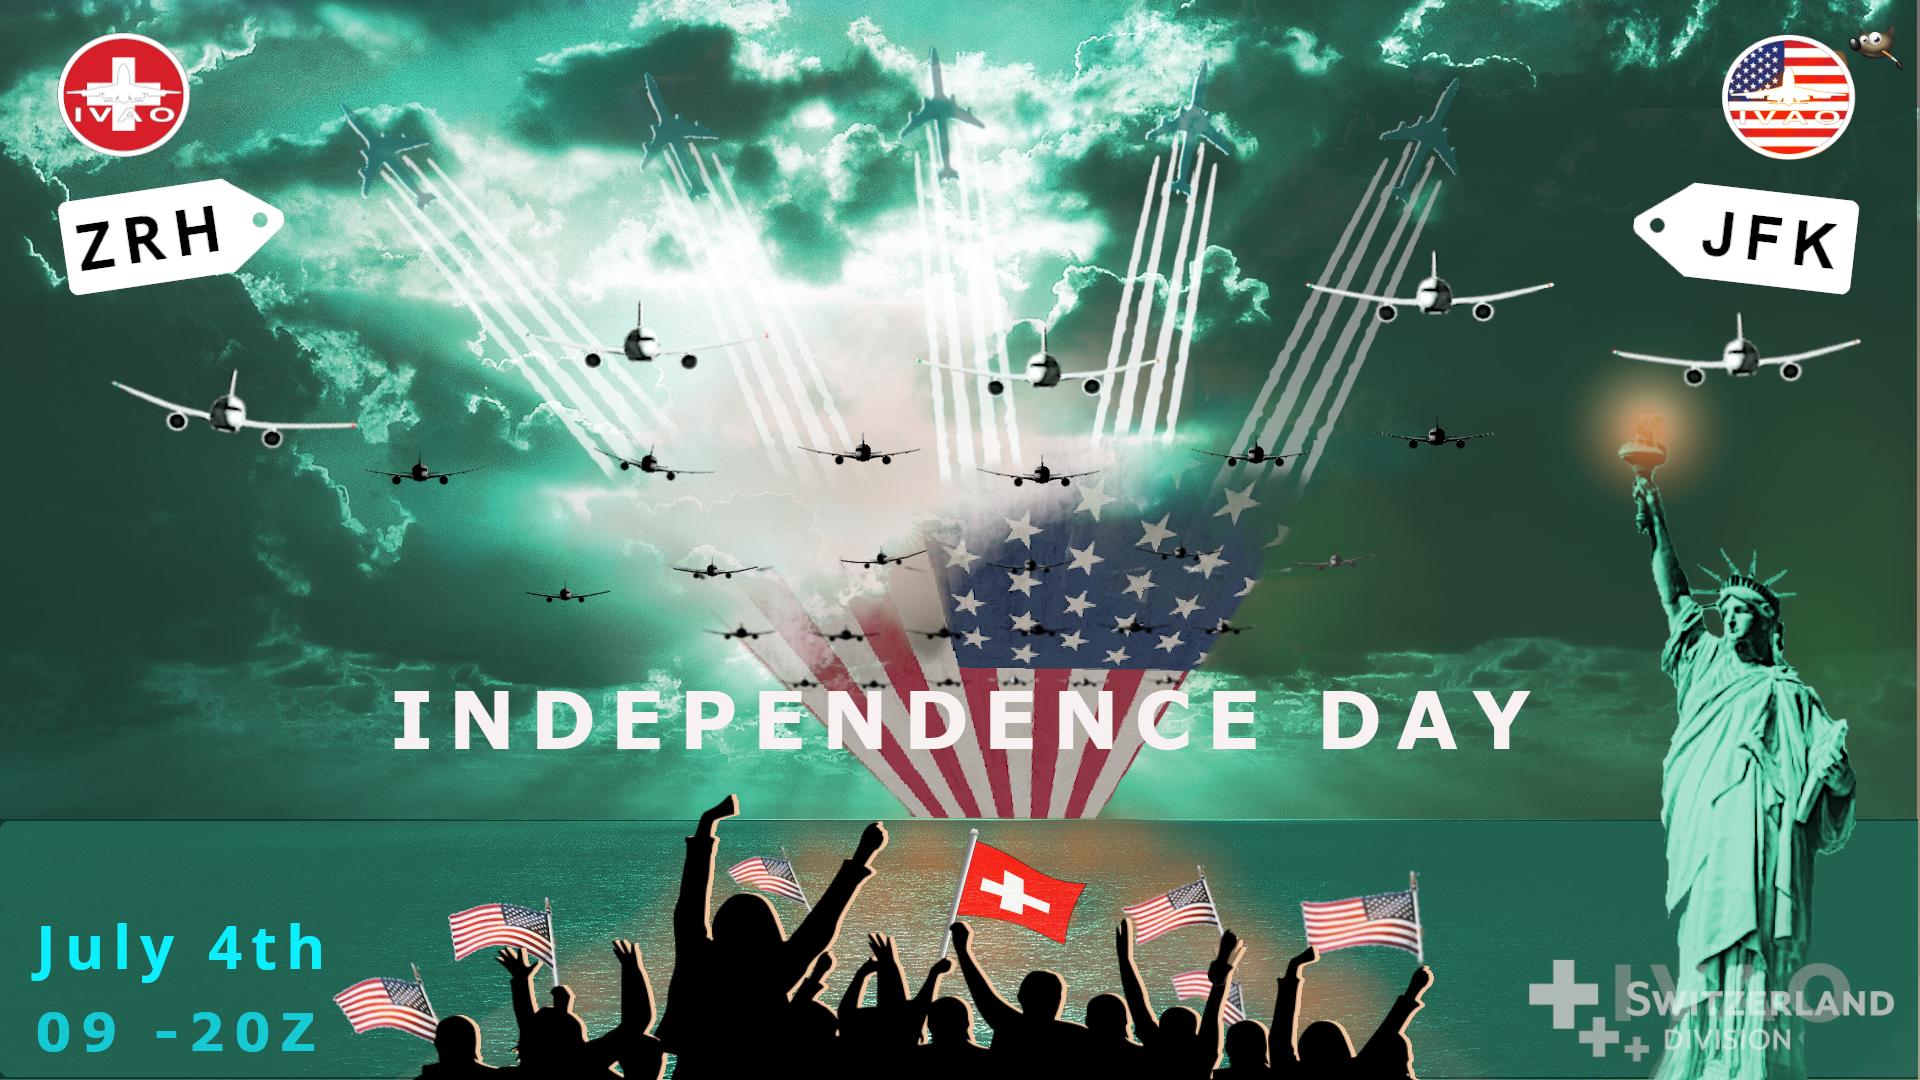 [CH+FR+XA+XU] Independence Day LSZH-KJFK